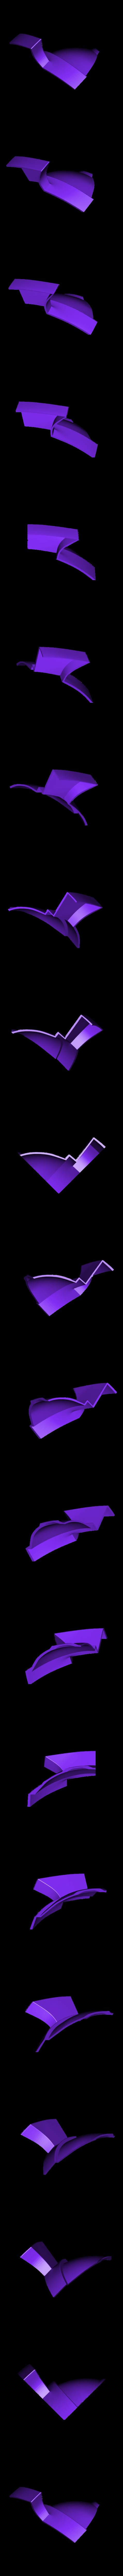 Part_10_v2.stl Download free STL file Senate Guard Helmet (Star Wars) • 3D printer design, VillainousPropShop